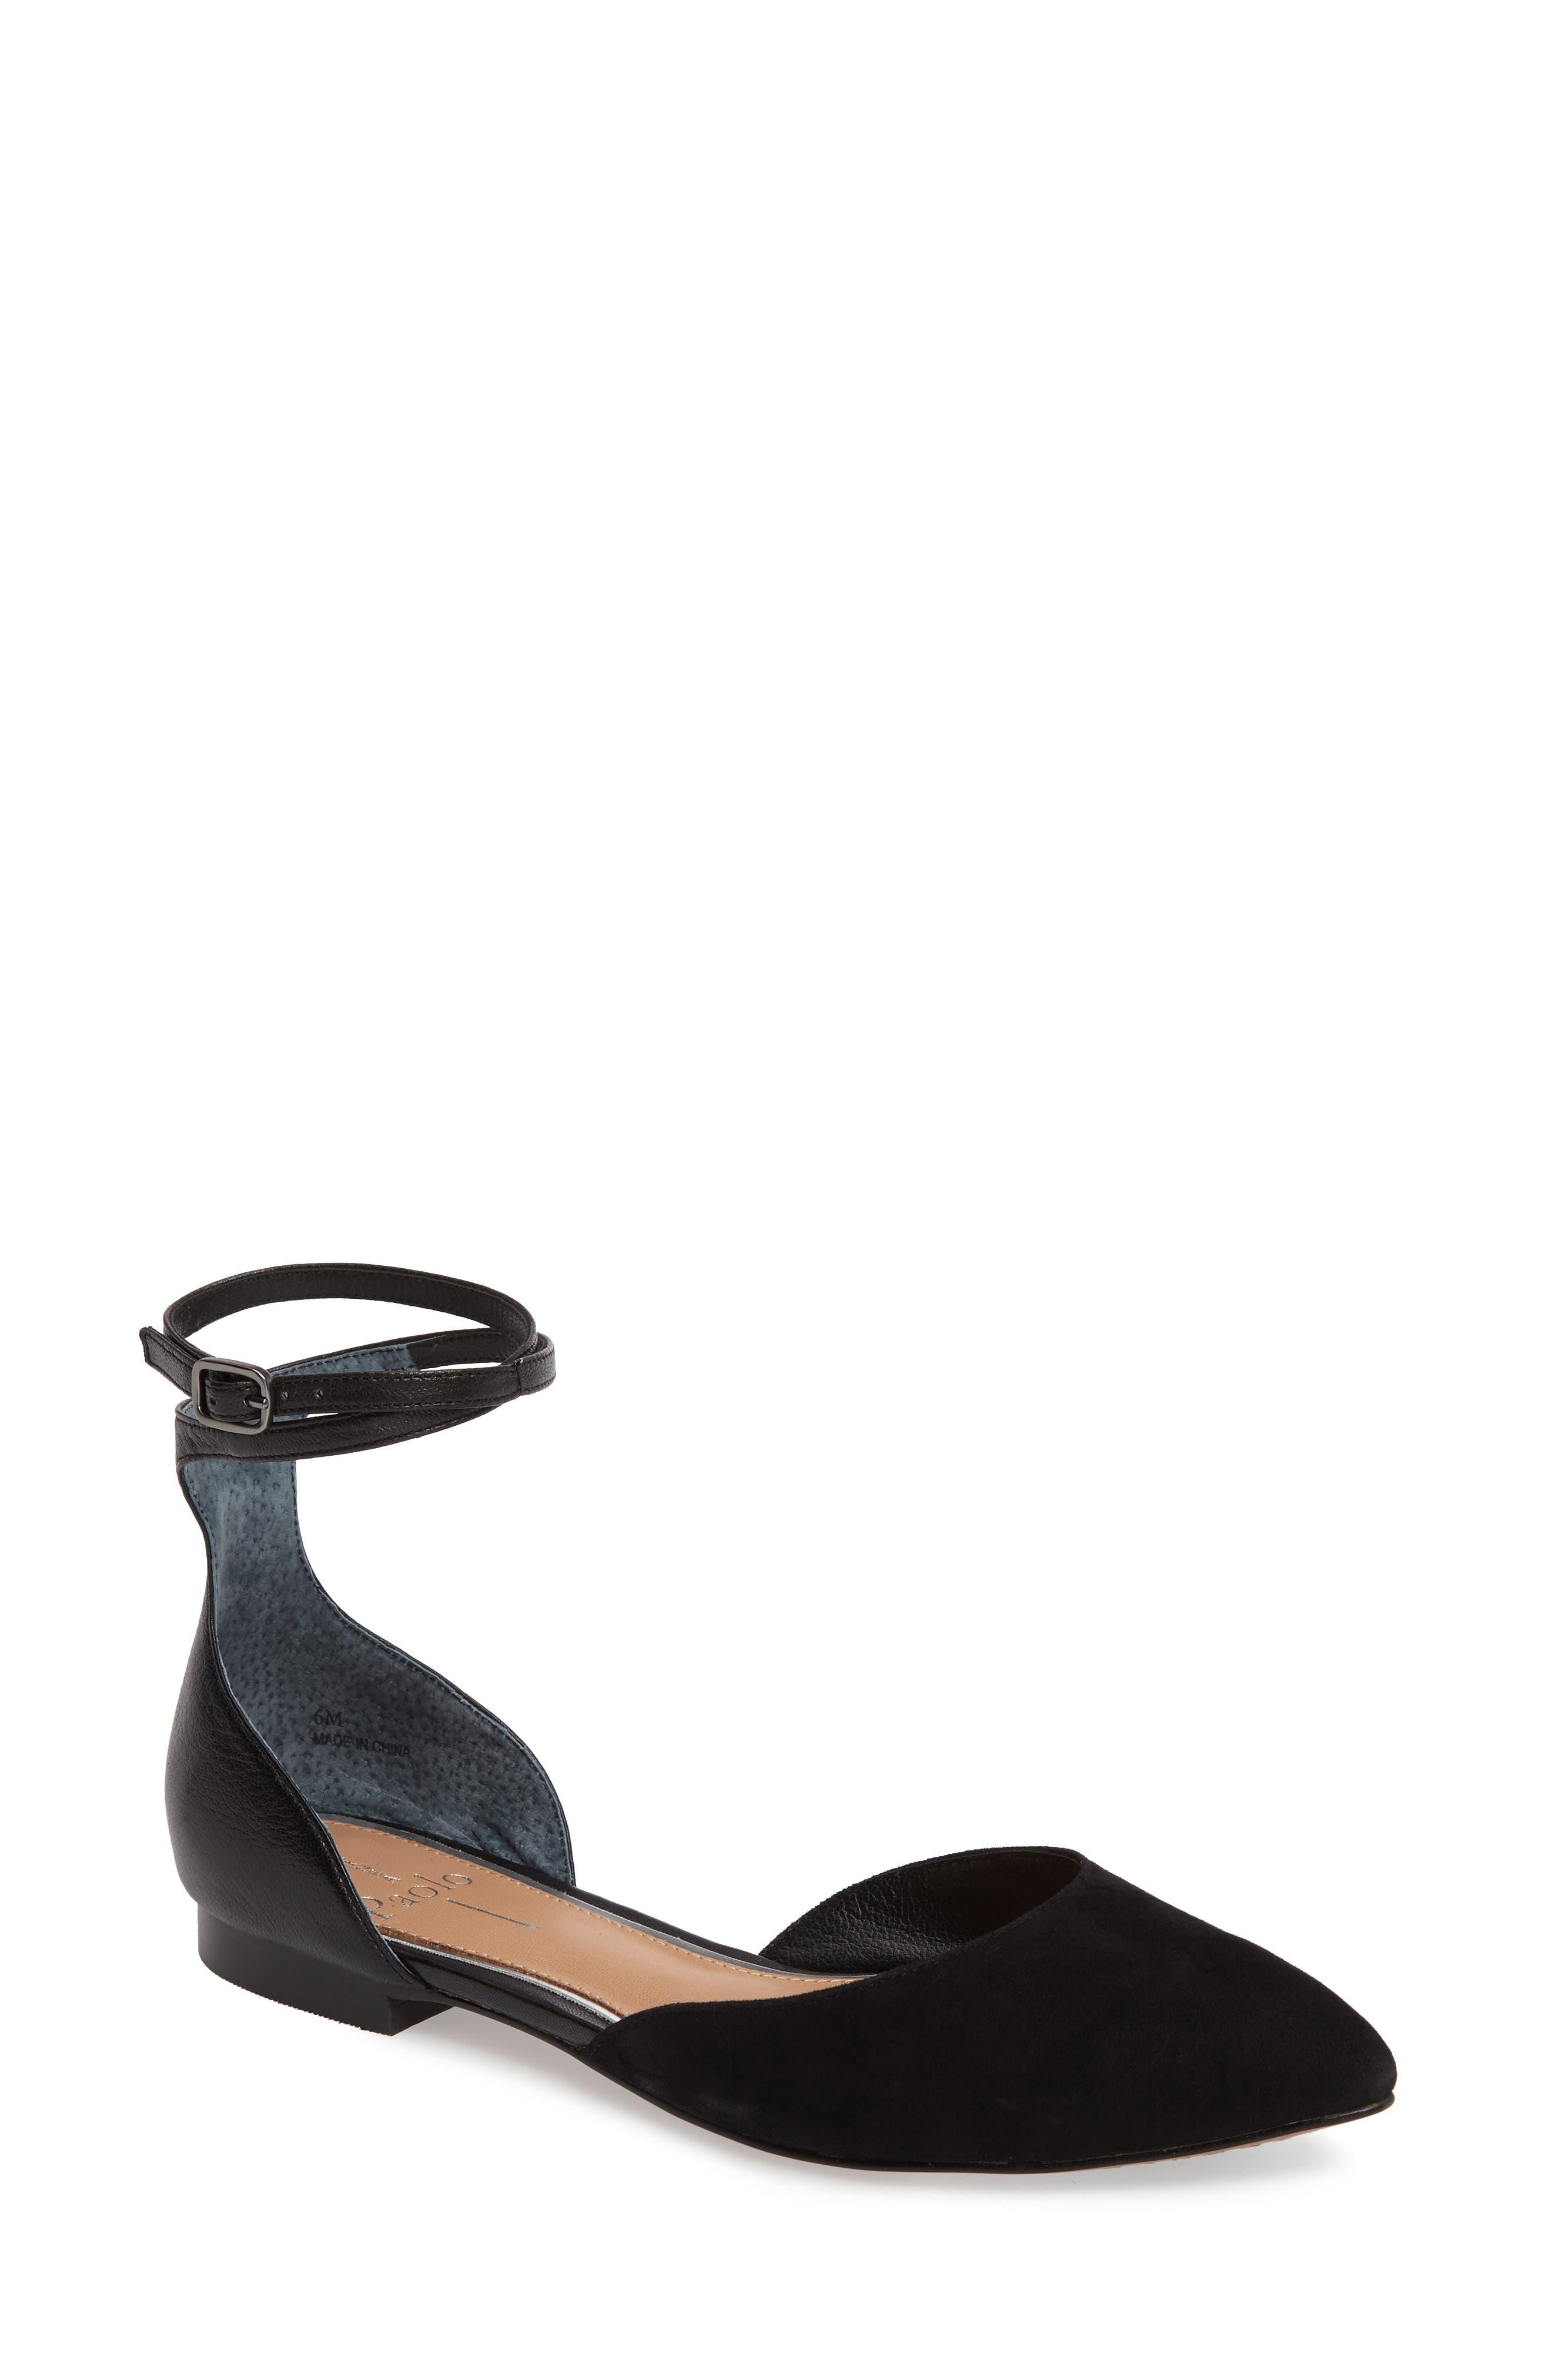 Main Image - Linea Paolo Dario Ankle Strap Flat (Women)